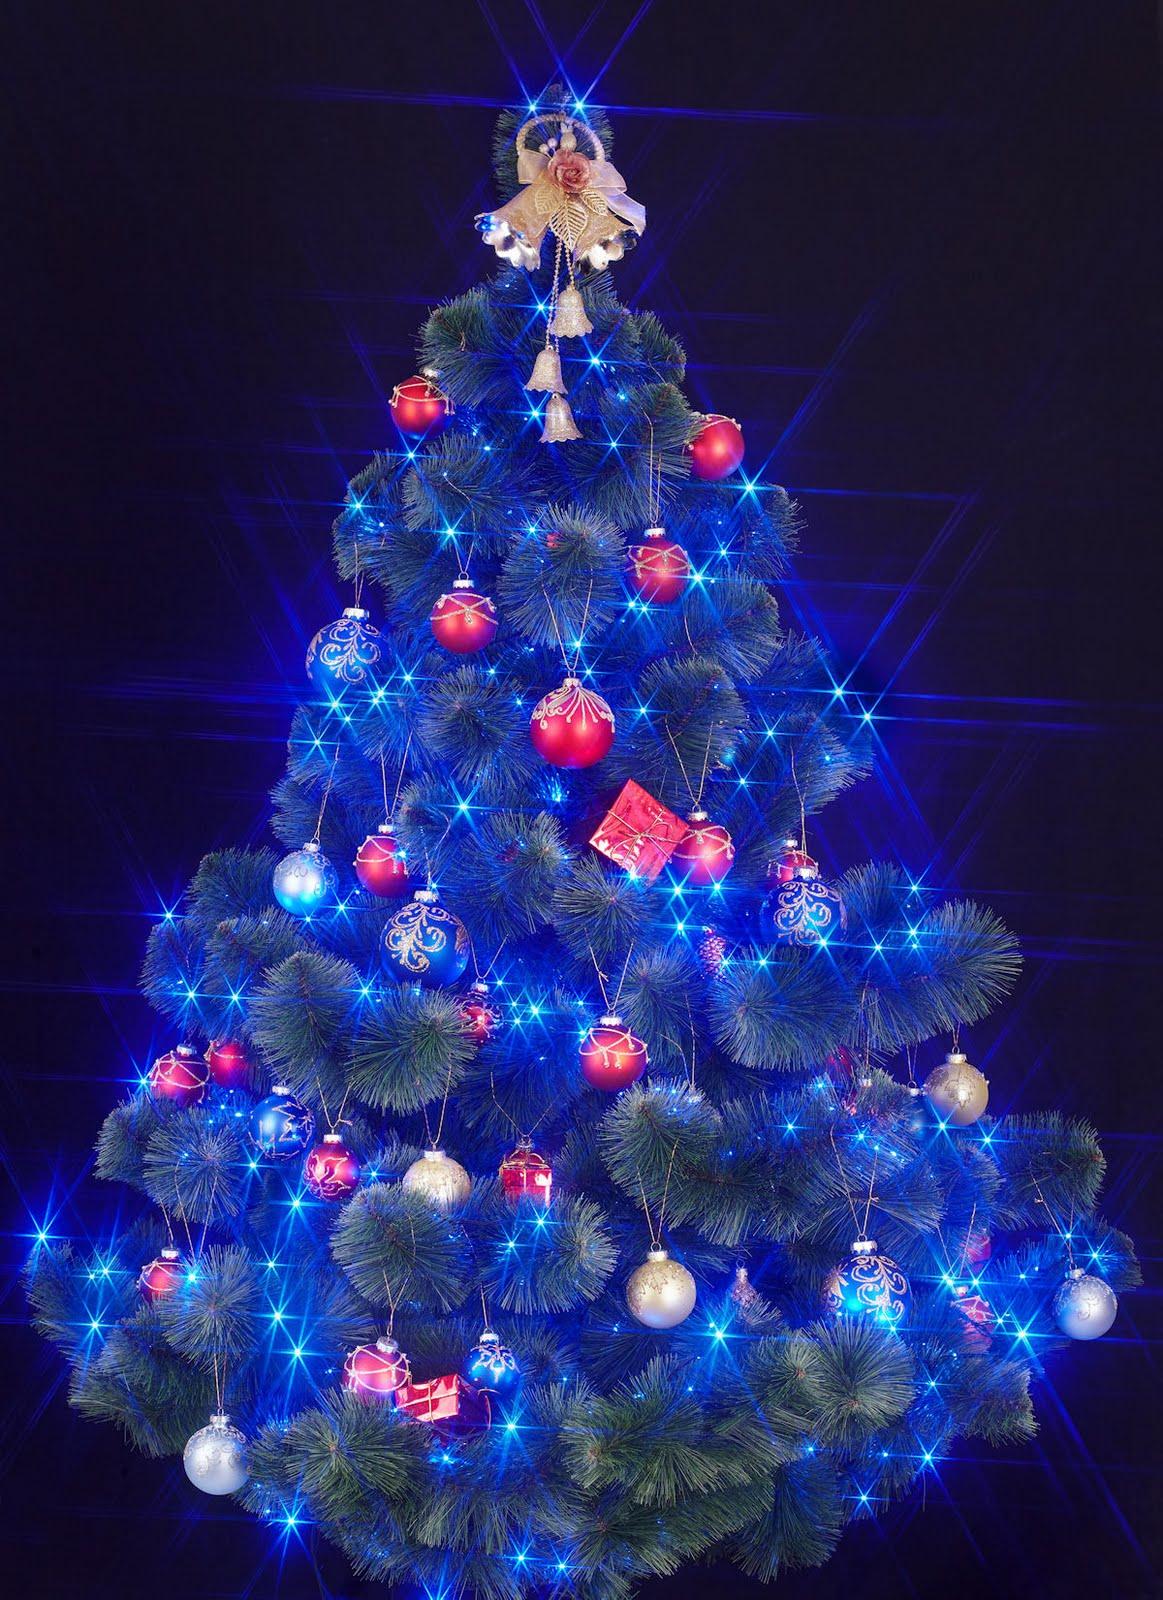 especial de fin de ao fotos de rboles de navidad